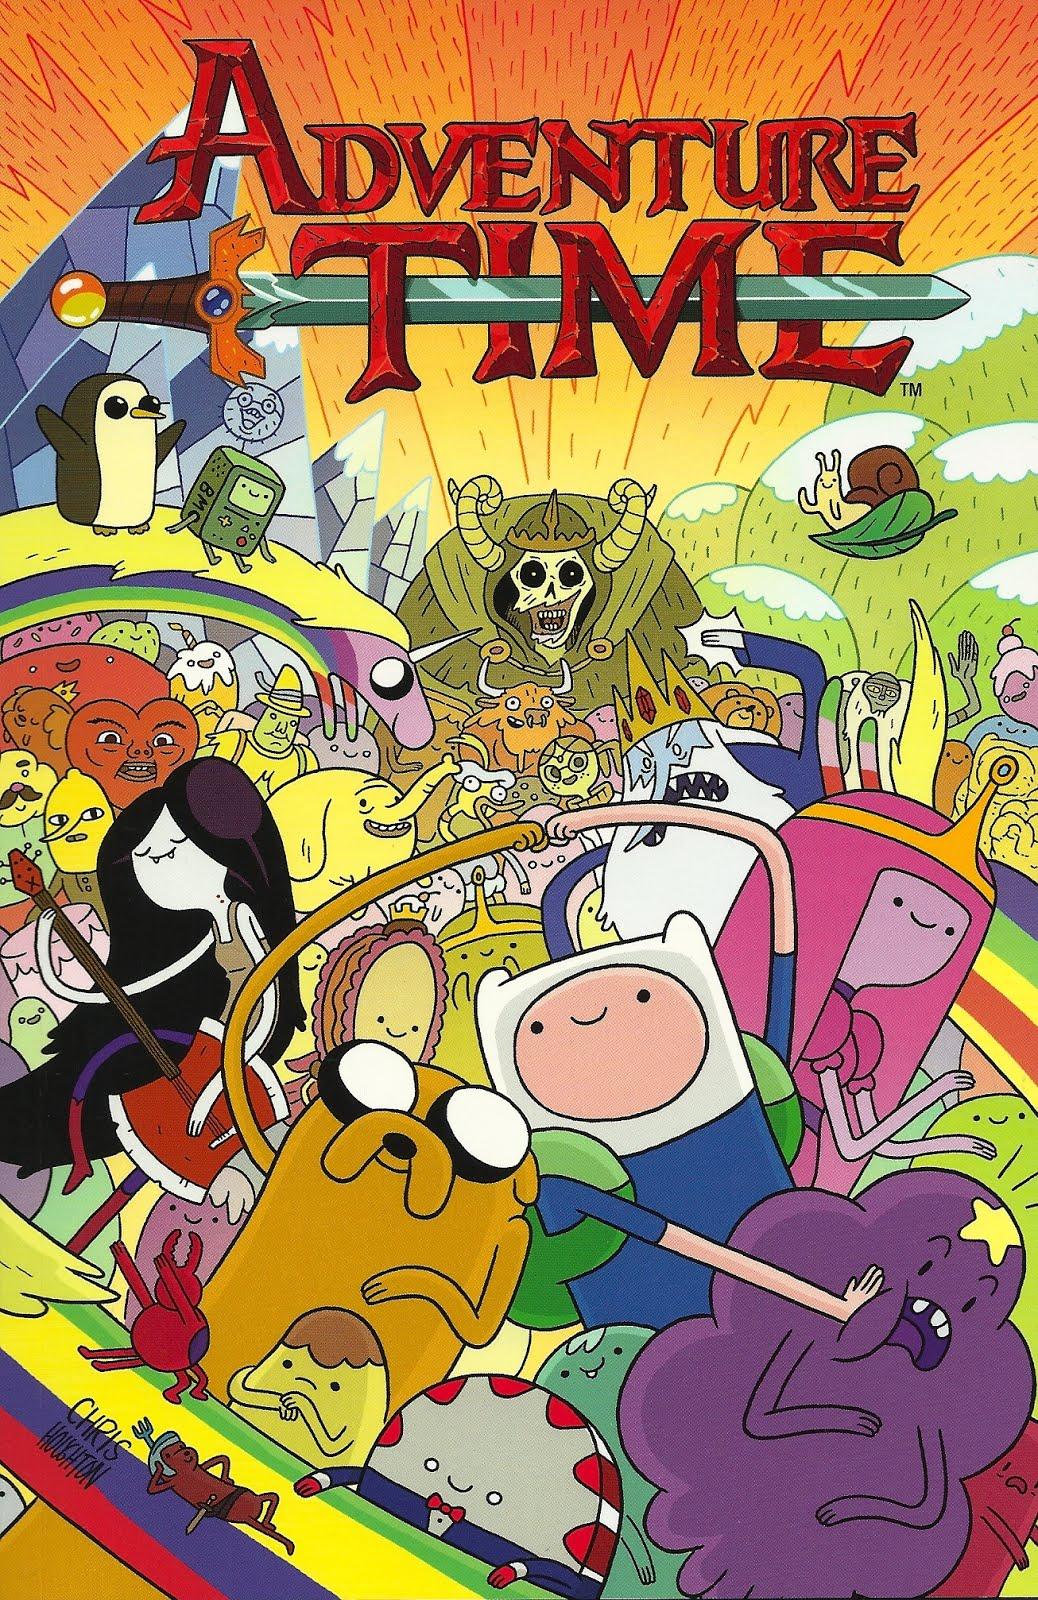 Wallpapers Todos Os Personagens De Hora Aventura Adventure Time